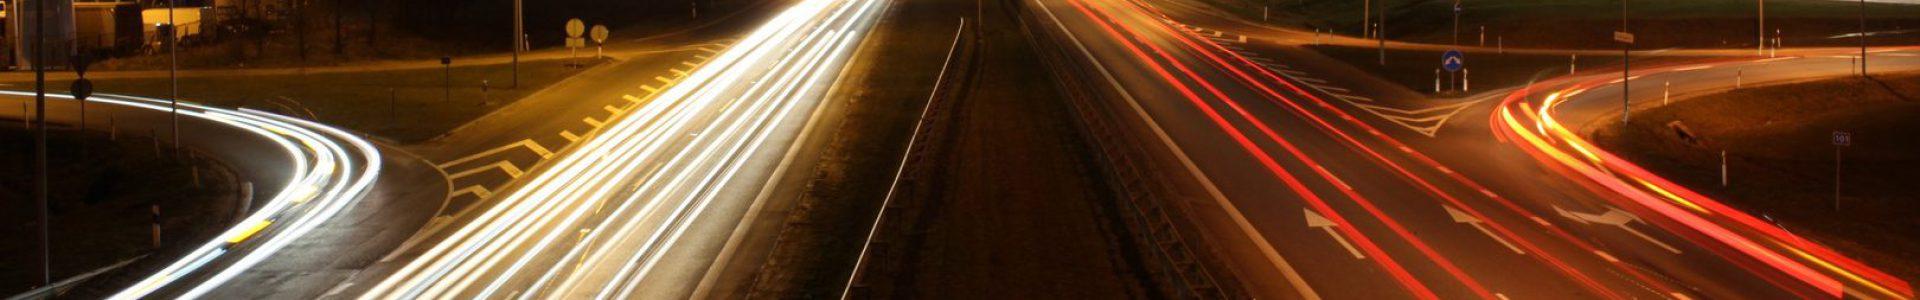 light-blur-road-bridge-traffic-night-874047-pxhere.com